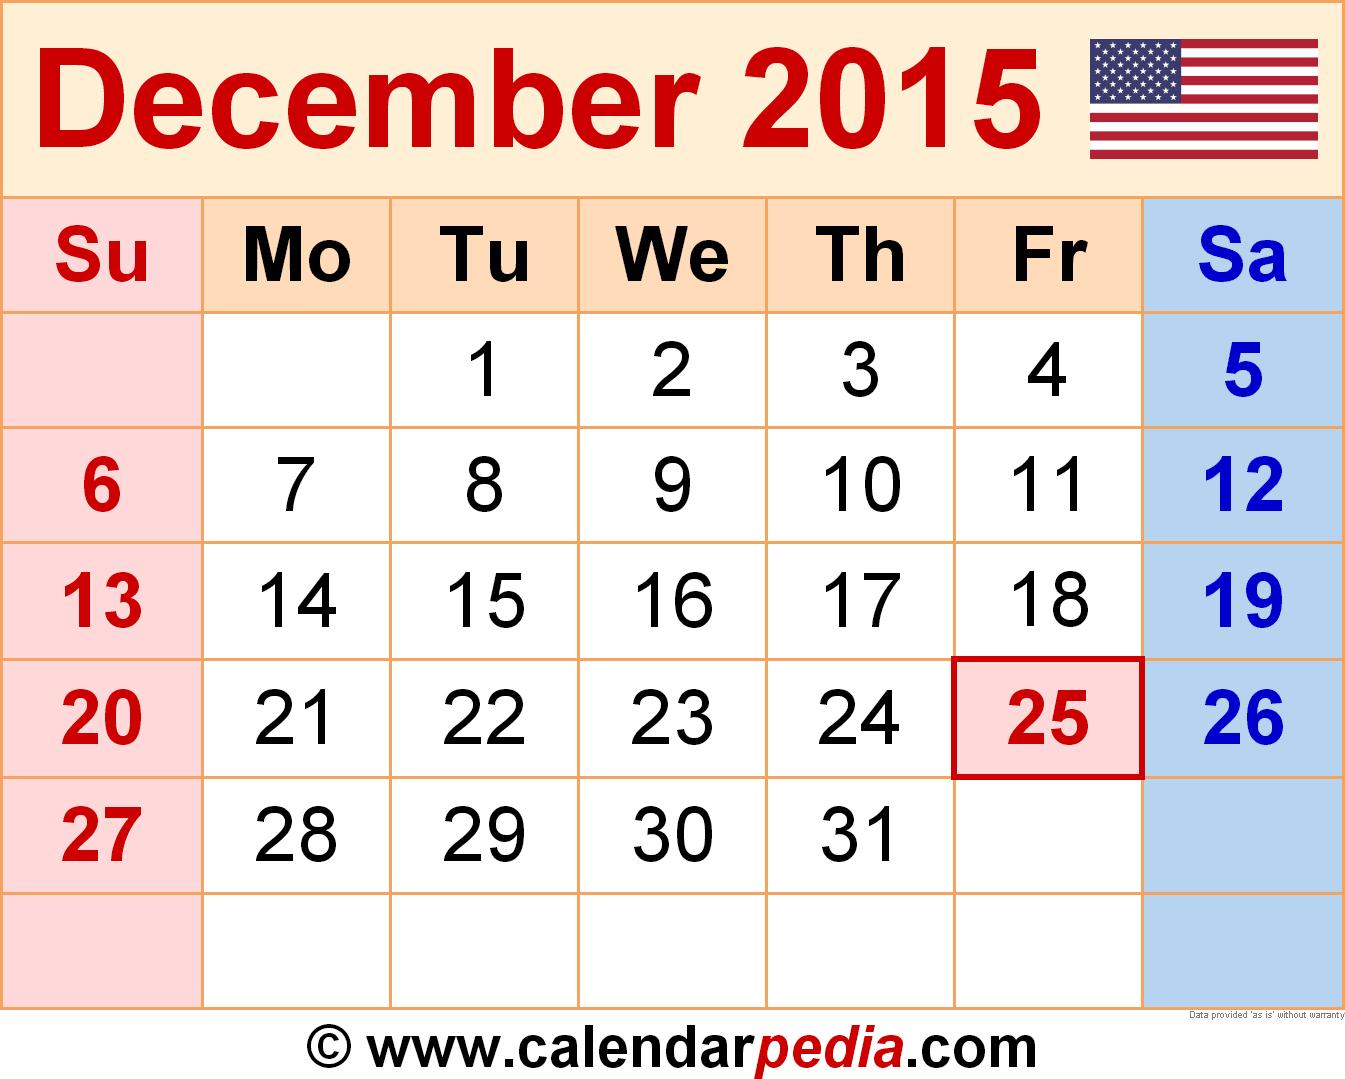 December 2015 Calendars For Word, Excel & Pdf | Free with December 2015 Calendar Printable